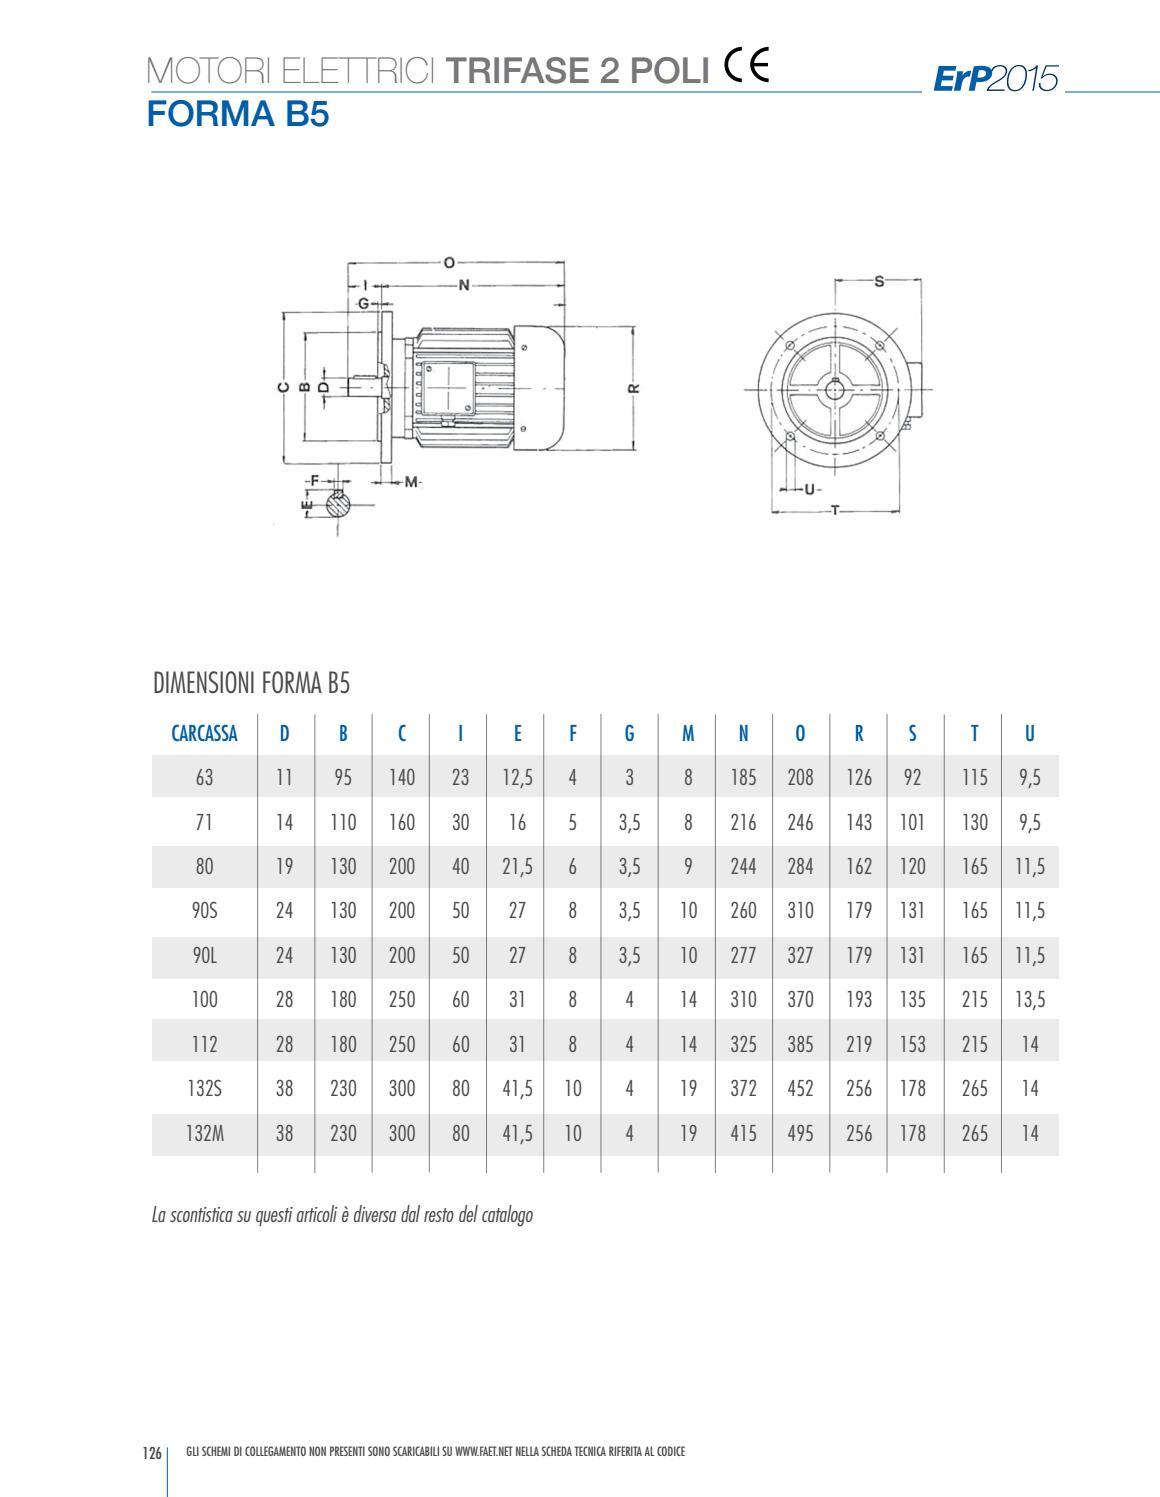 Schema Elettrico Trifase : Faet 2015 catalogo ventilatori motori by simone banfi issuu